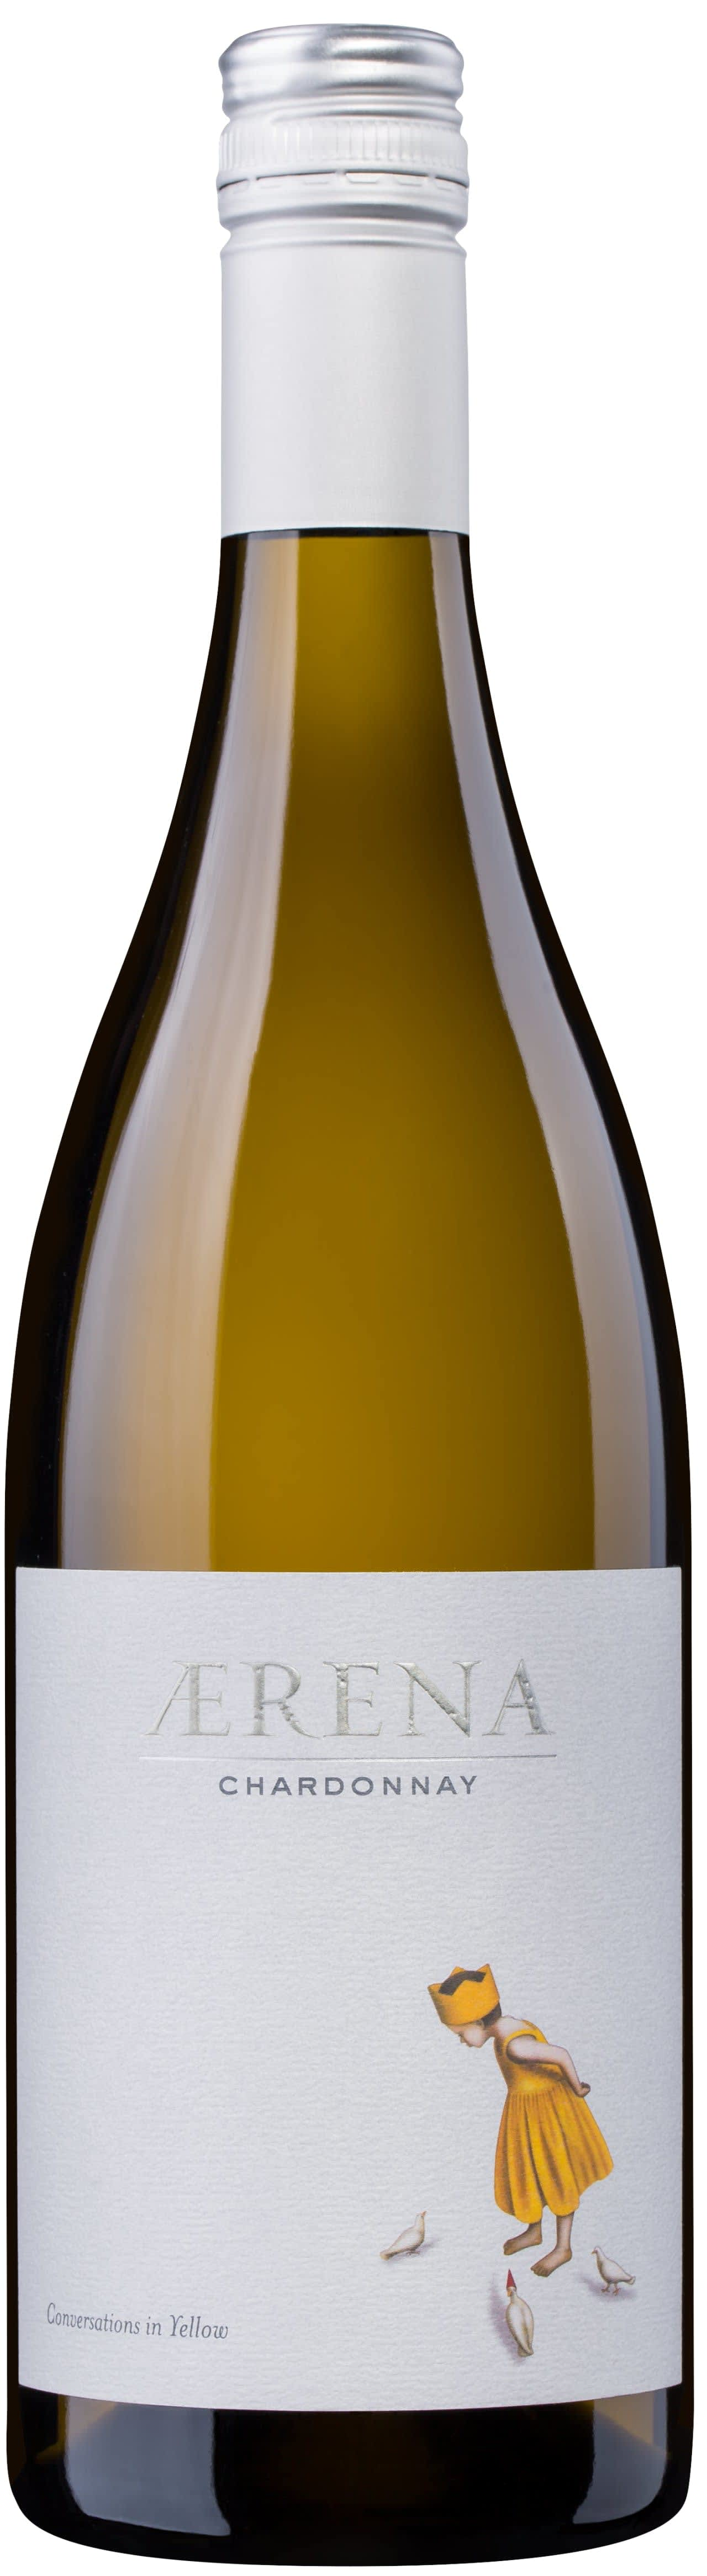 Chardonnay at Wine.com